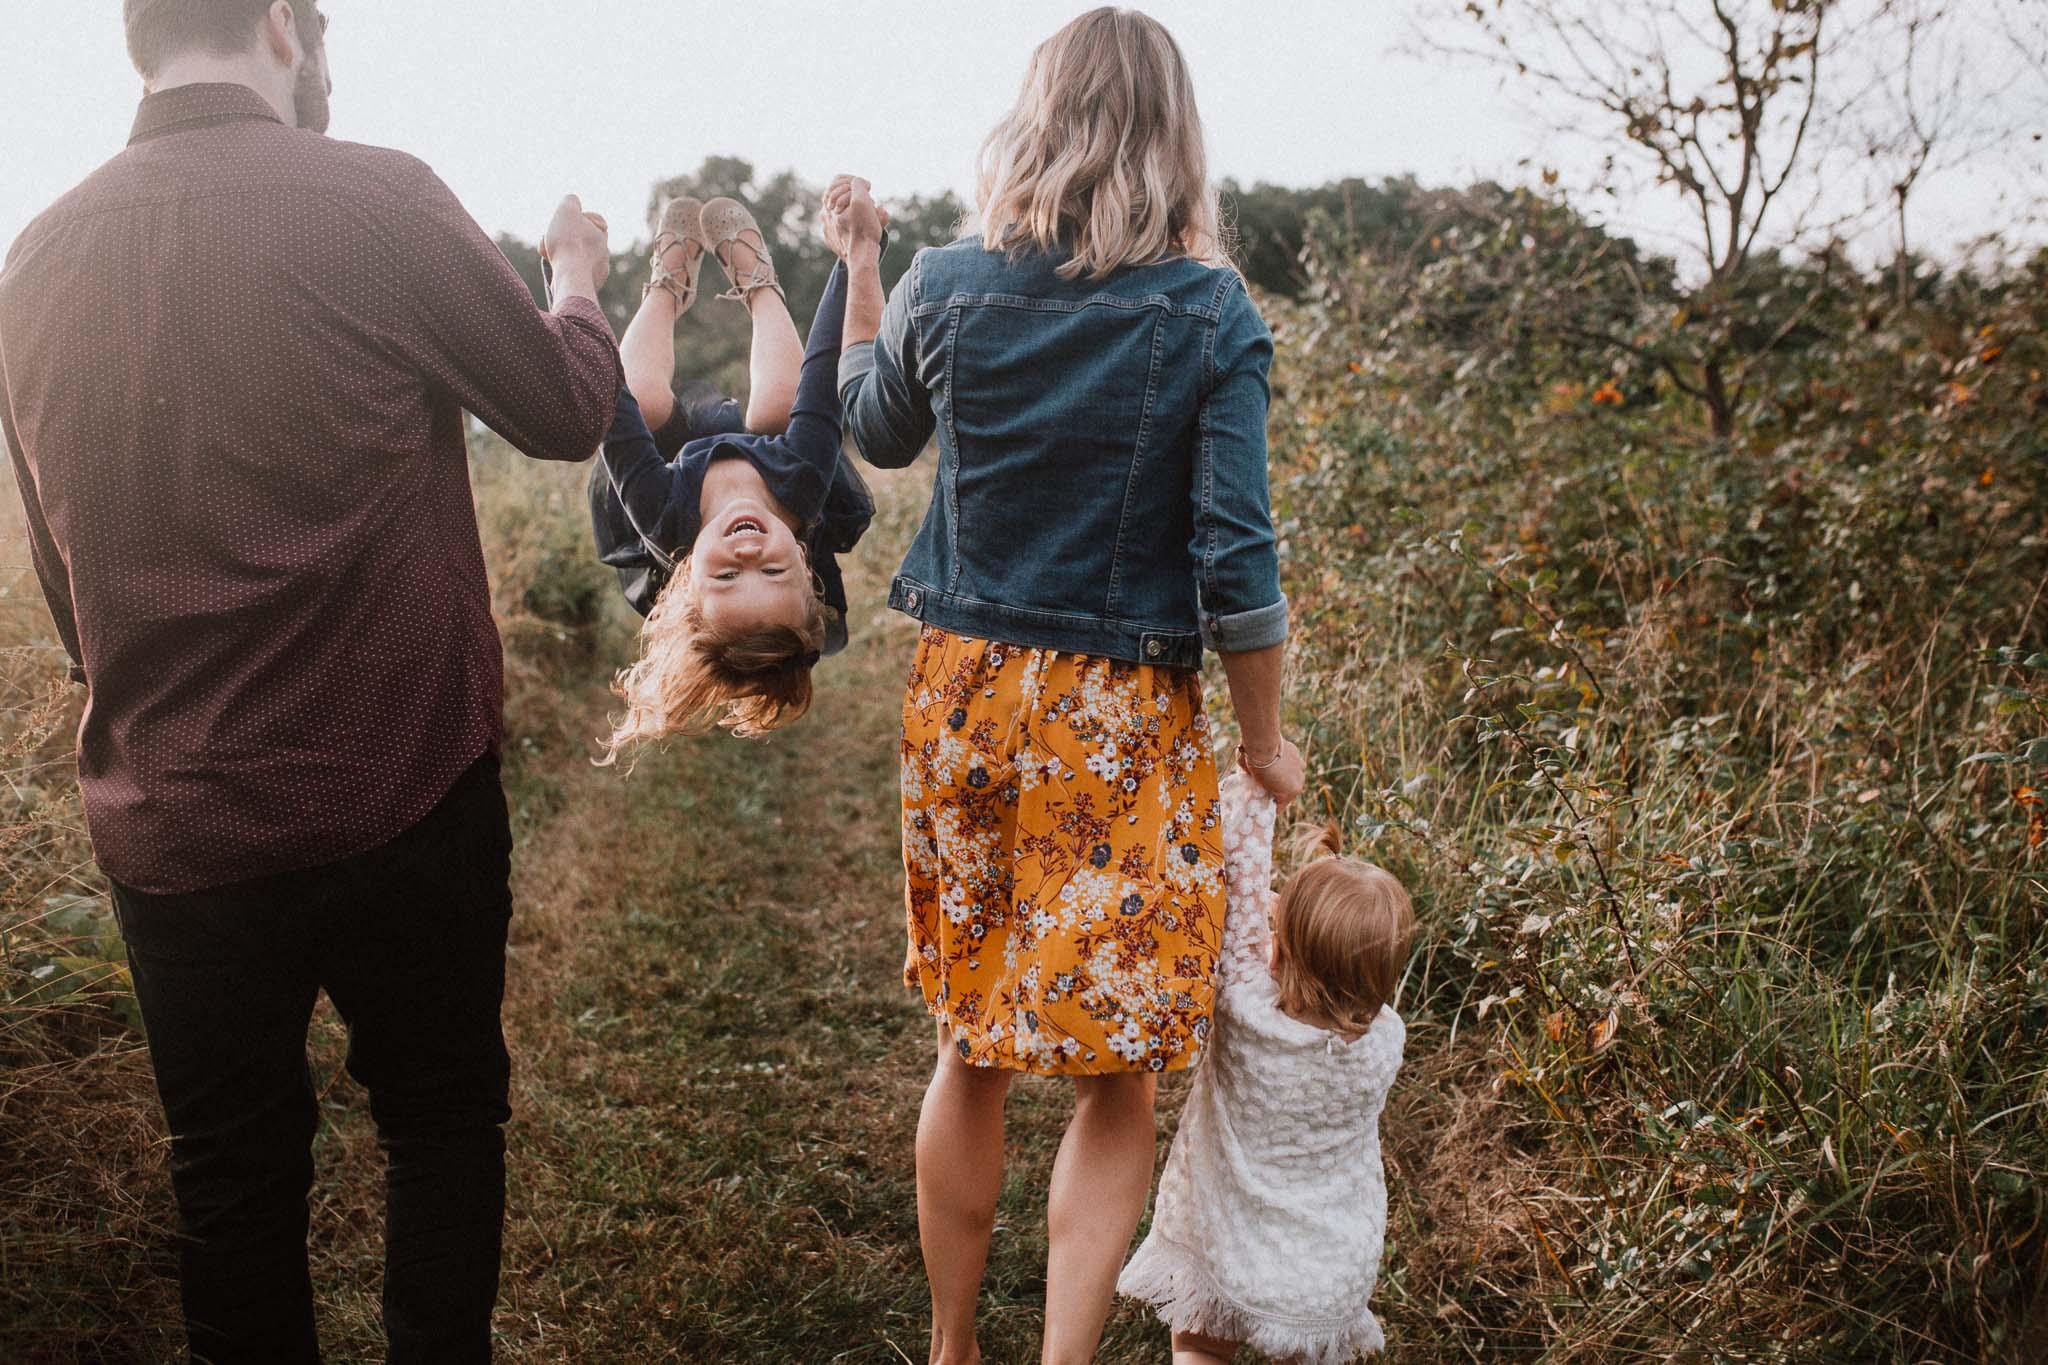 daughter siblings swing family sunset golden Rust Nature Sanctuary Leesburg Loudoun Virginia Lifestyle Documentary Marti Austin Photography